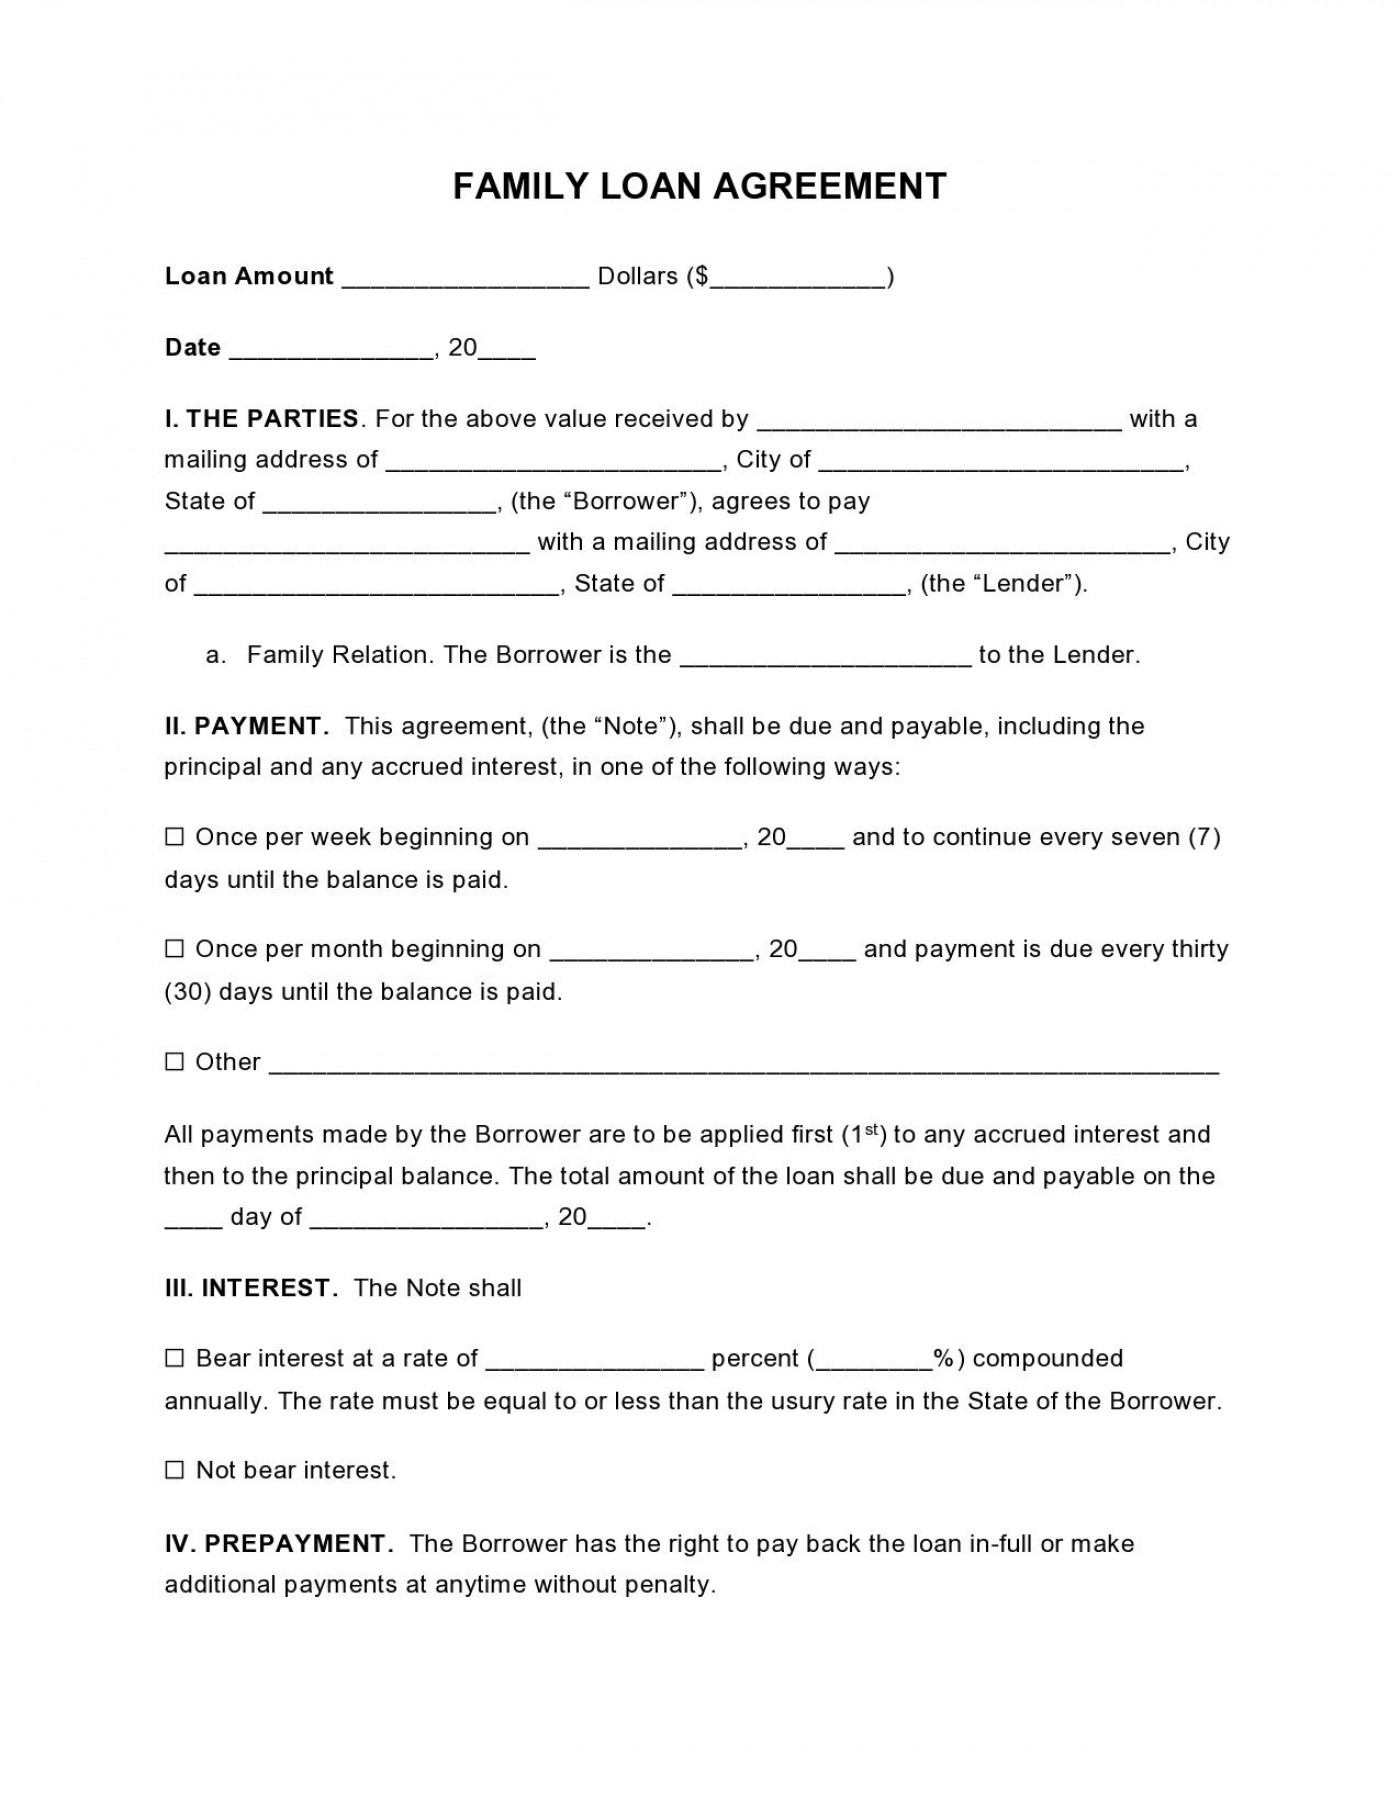 000 Wondrou Free Family Loan Agreement Template Nz High Definition 1400